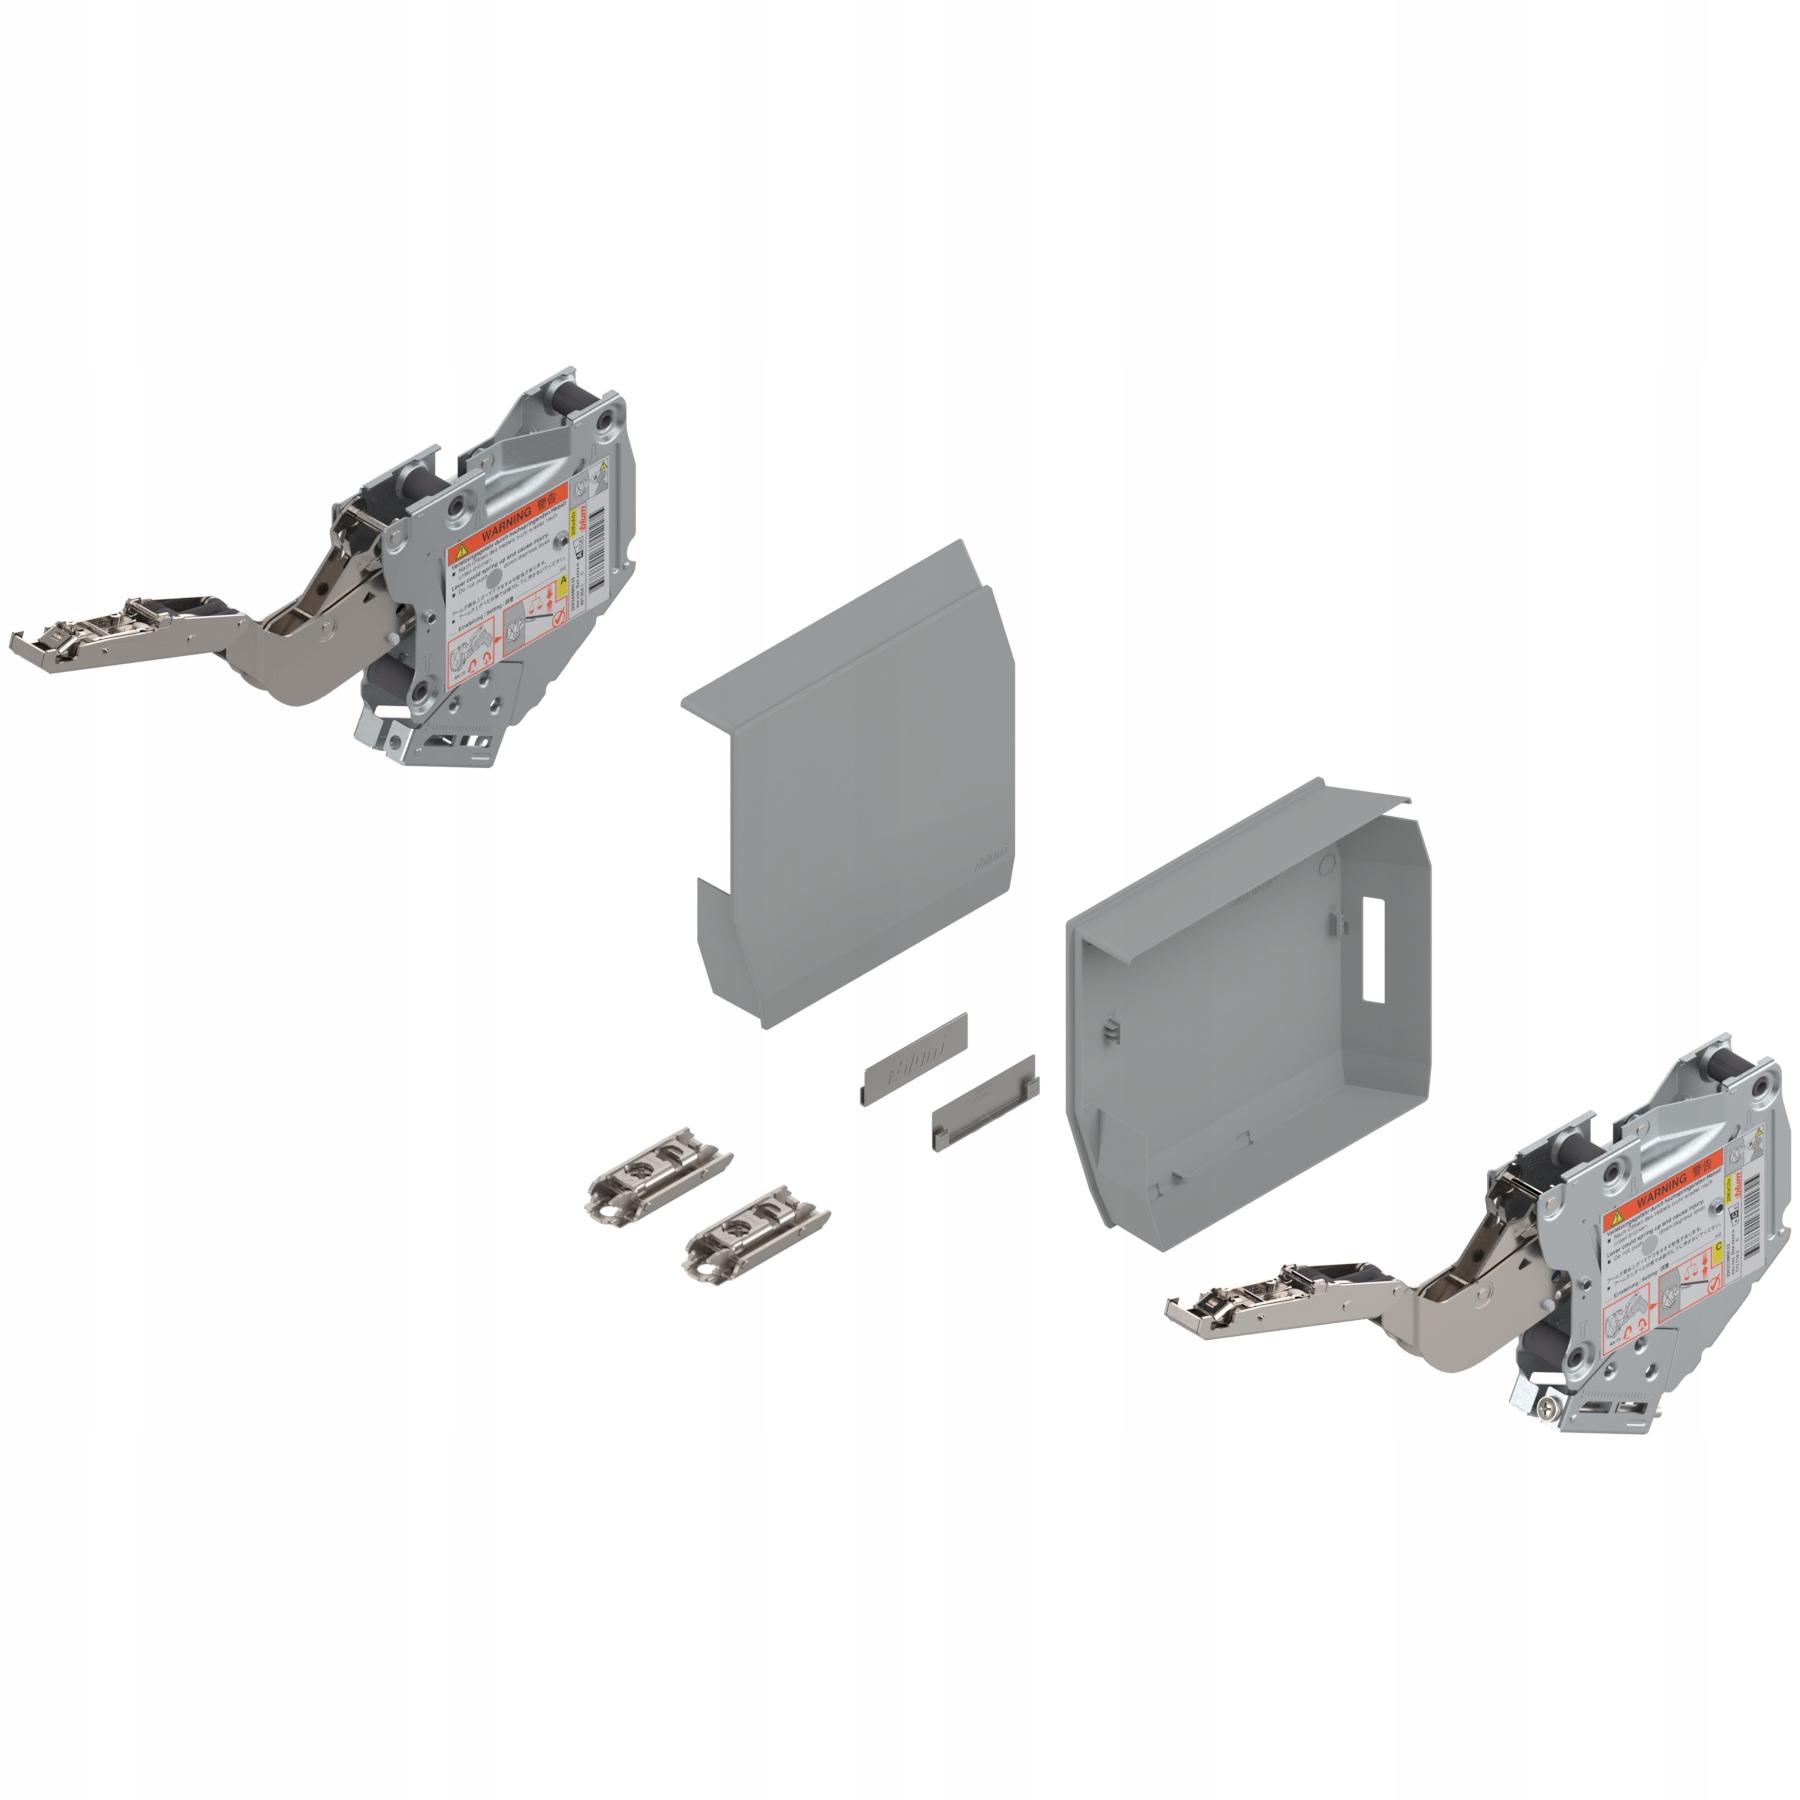 Aventos HK-S Blum TIP-ON 20K2E01T sivý zdvih